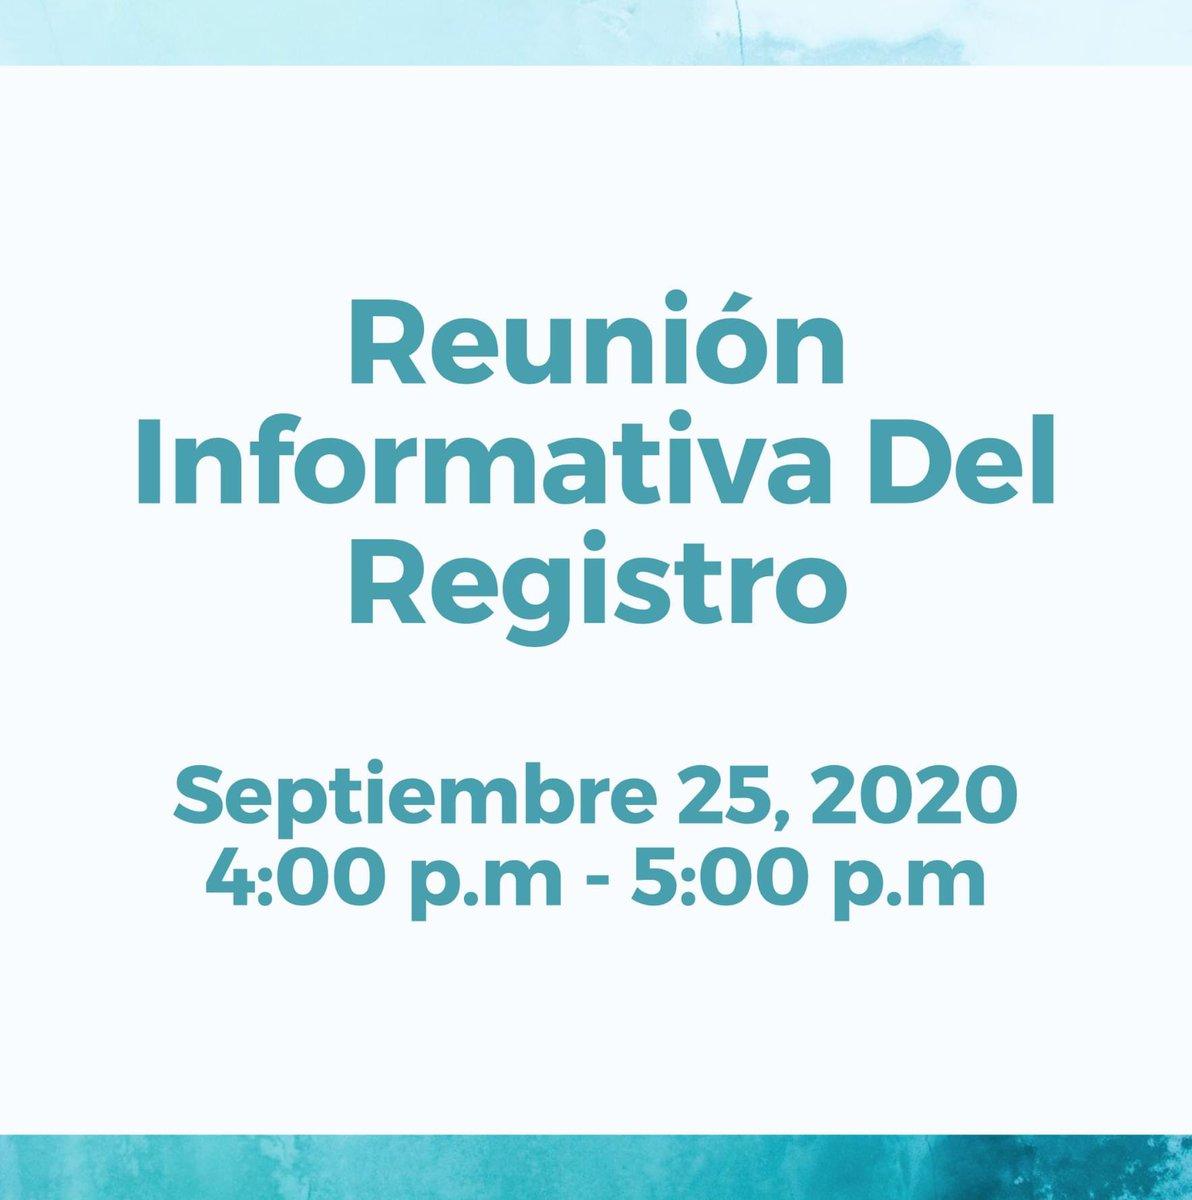 Estamos buscando proveedores de IHSS. Únete a la reunión con Zoom. Esta reunión será en español. Si está interesado, regístrese hoy en el siguiente enlace https://t.co/UU5V7VmmHE.  #pasc #pascla #ihss #consumers #providers #losangeles #LACounty https://t.co/HmBTb7fJ8u